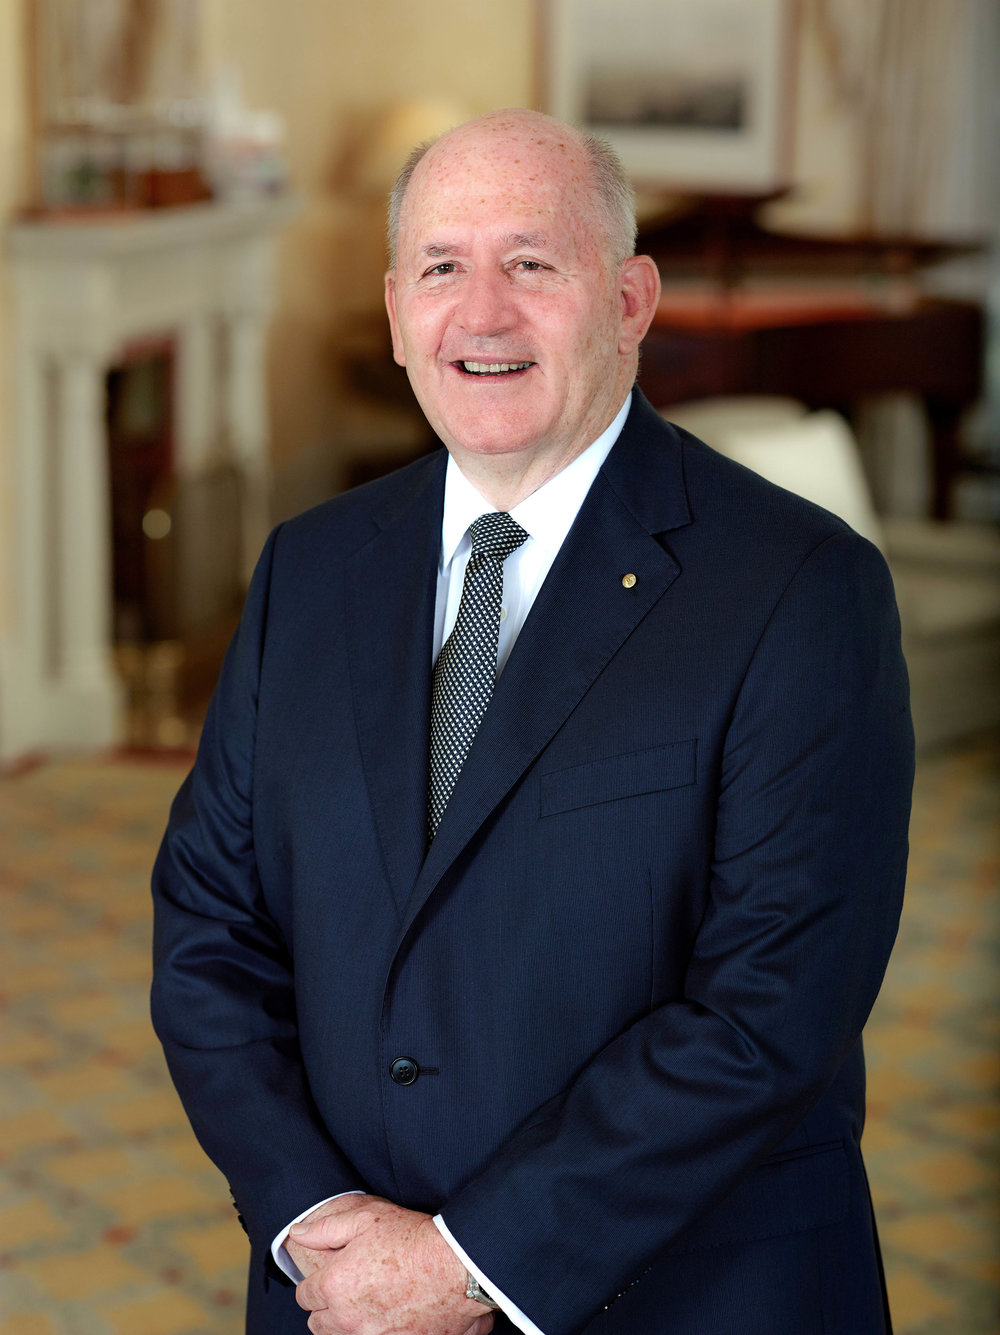 His Excellency General the Honourable Sir Peter Cosgrove AK MC (Retd)